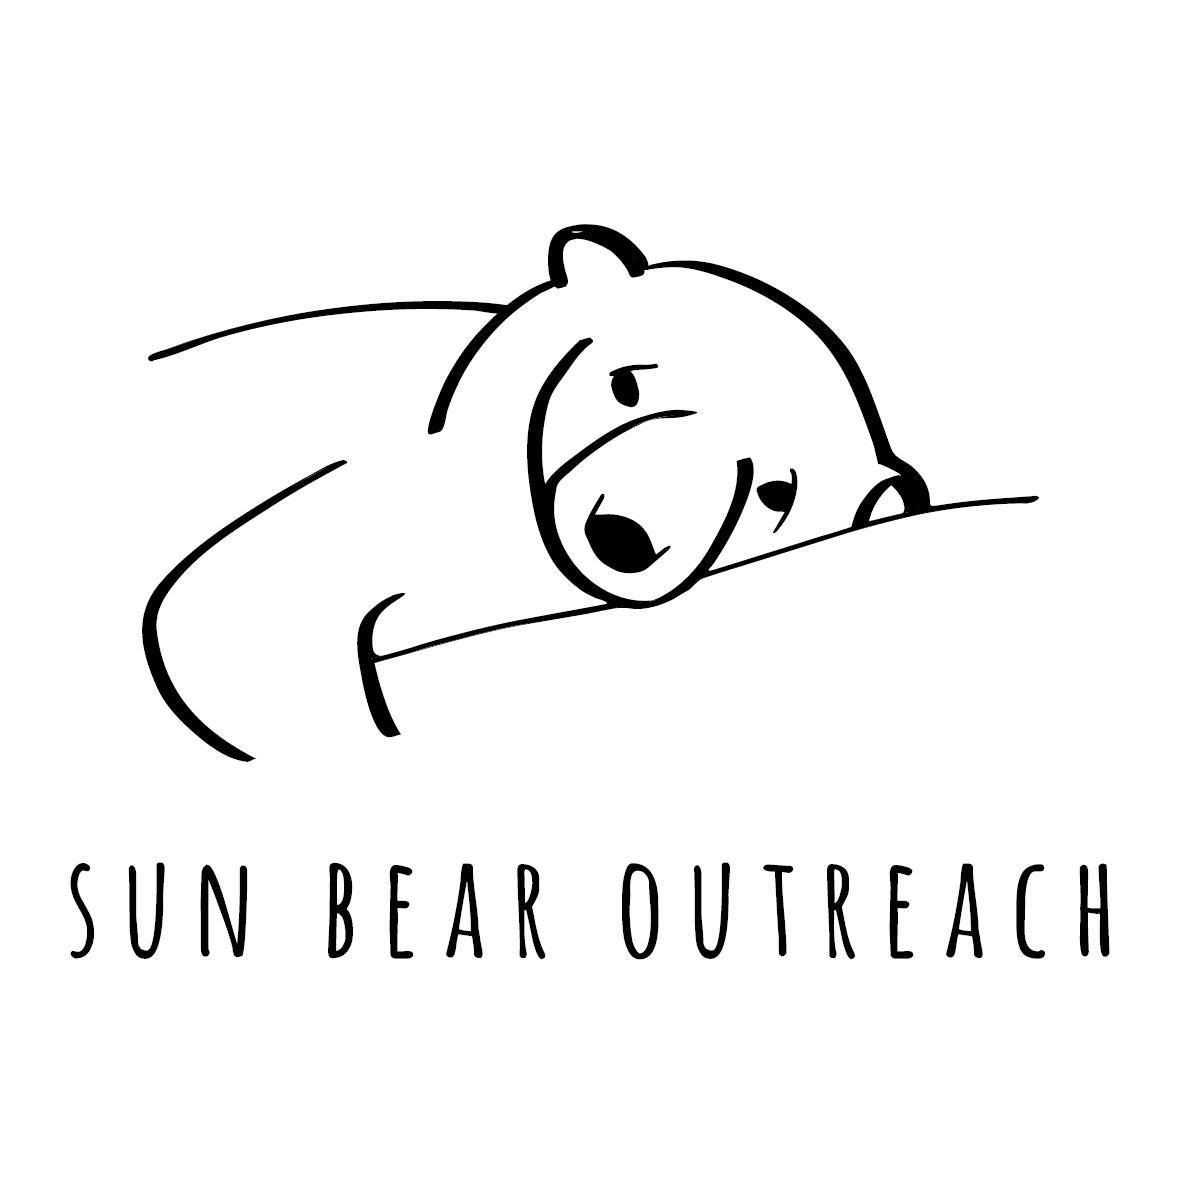 Aider les Ours / Sun Bear Outreach logo